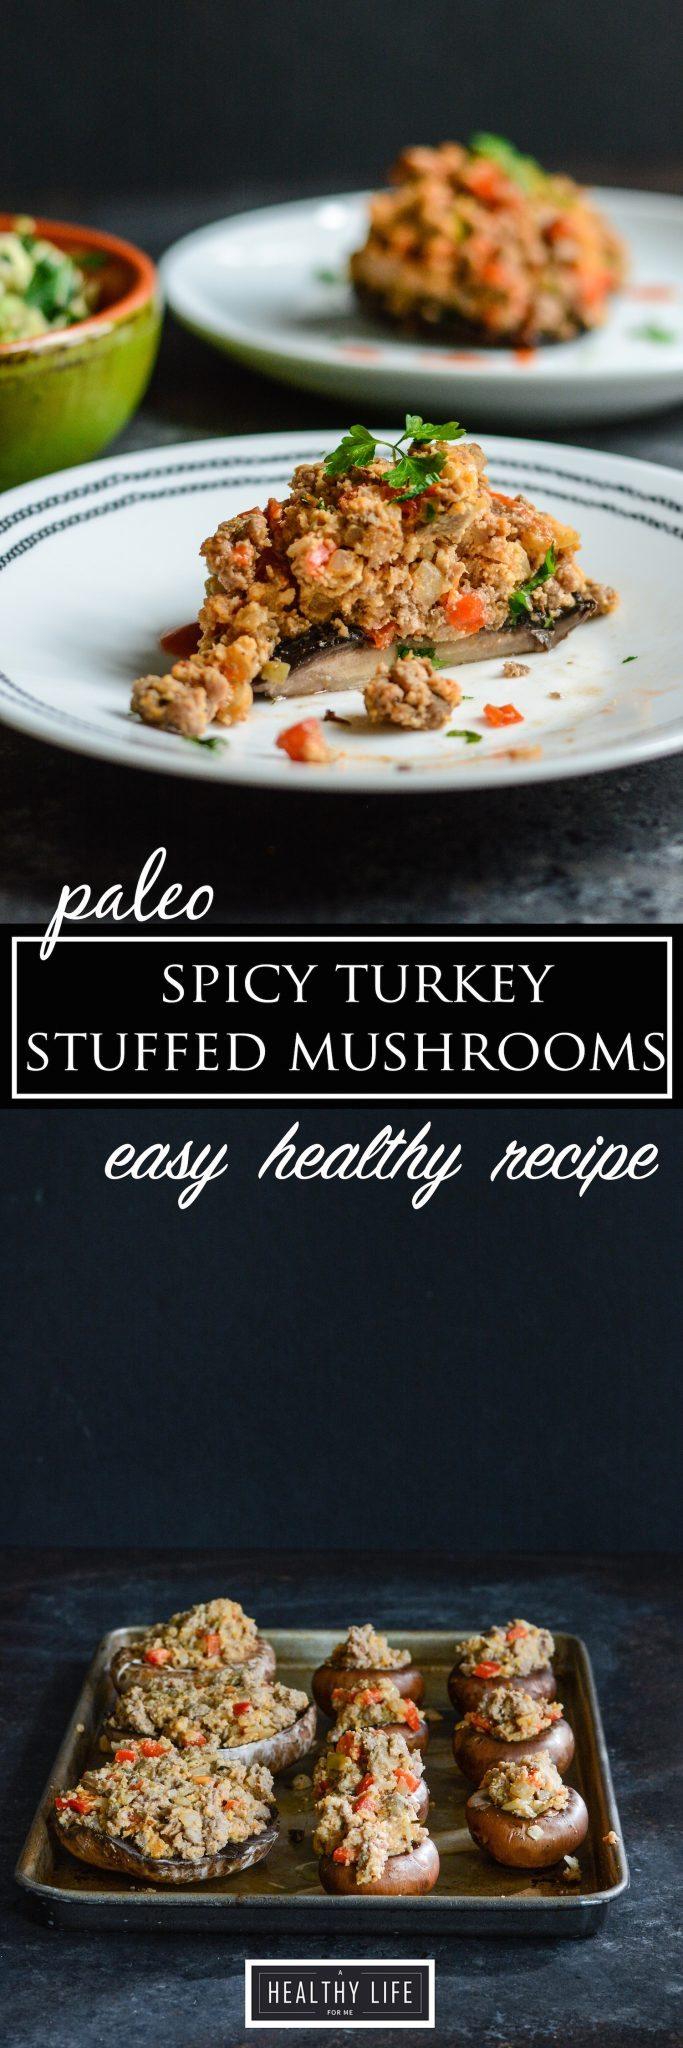 Paleo Spicy Turkey Stuffed Mushrooms Recipe | ahealthylifeforme.com